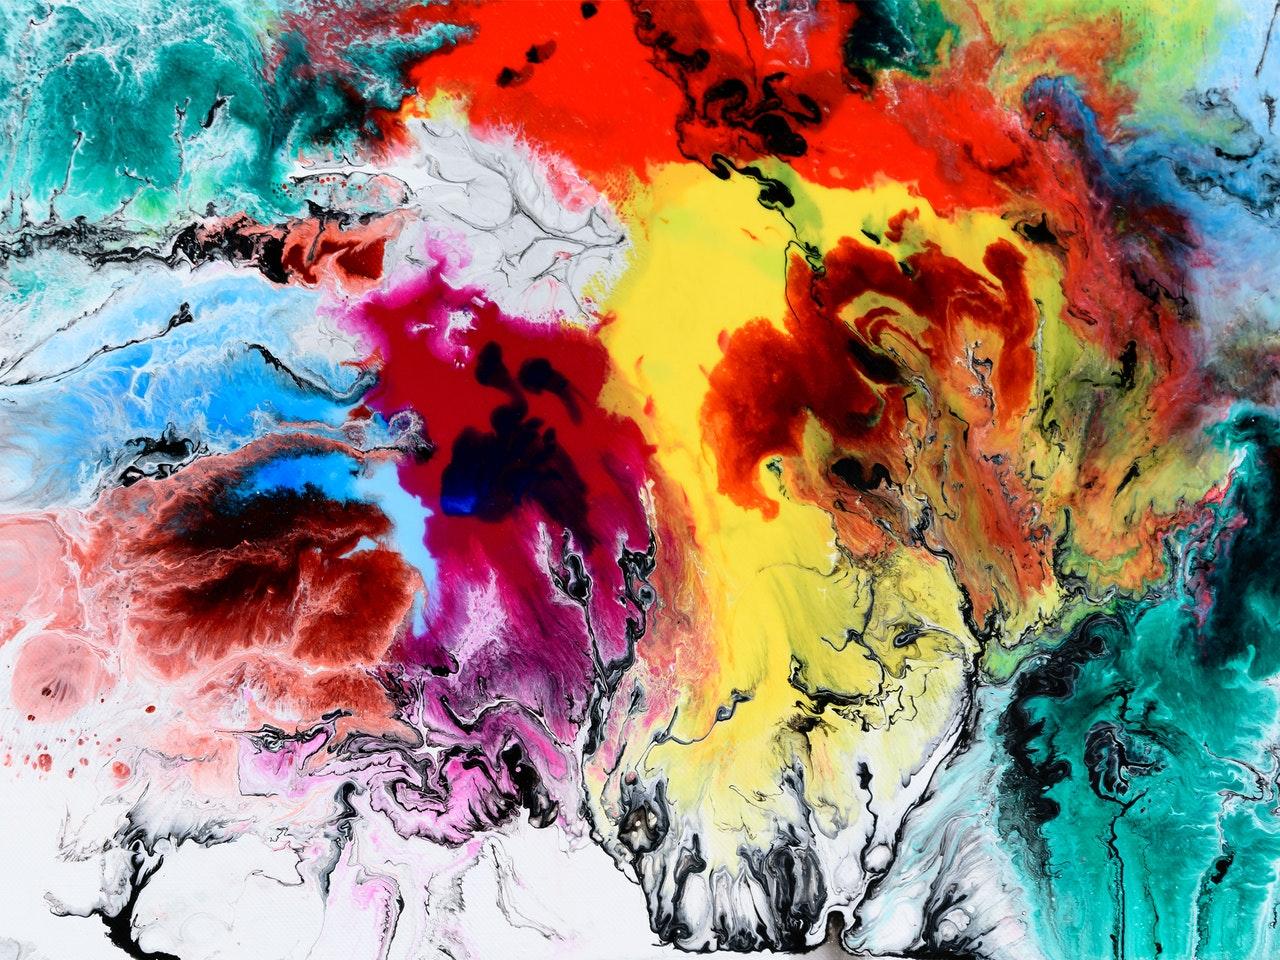 Fargerikt samtidskunstverk